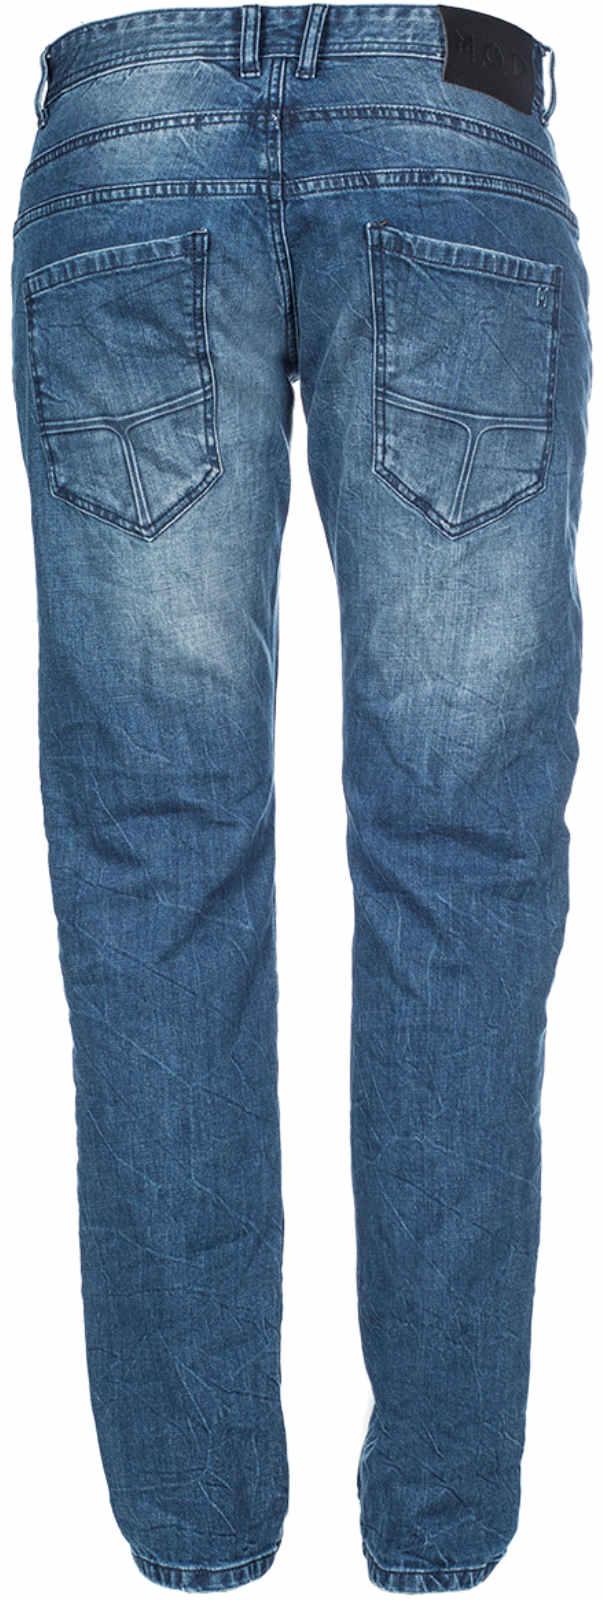 m o d herren jeans jason regular nos 1028 low waist neu. Black Bedroom Furniture Sets. Home Design Ideas